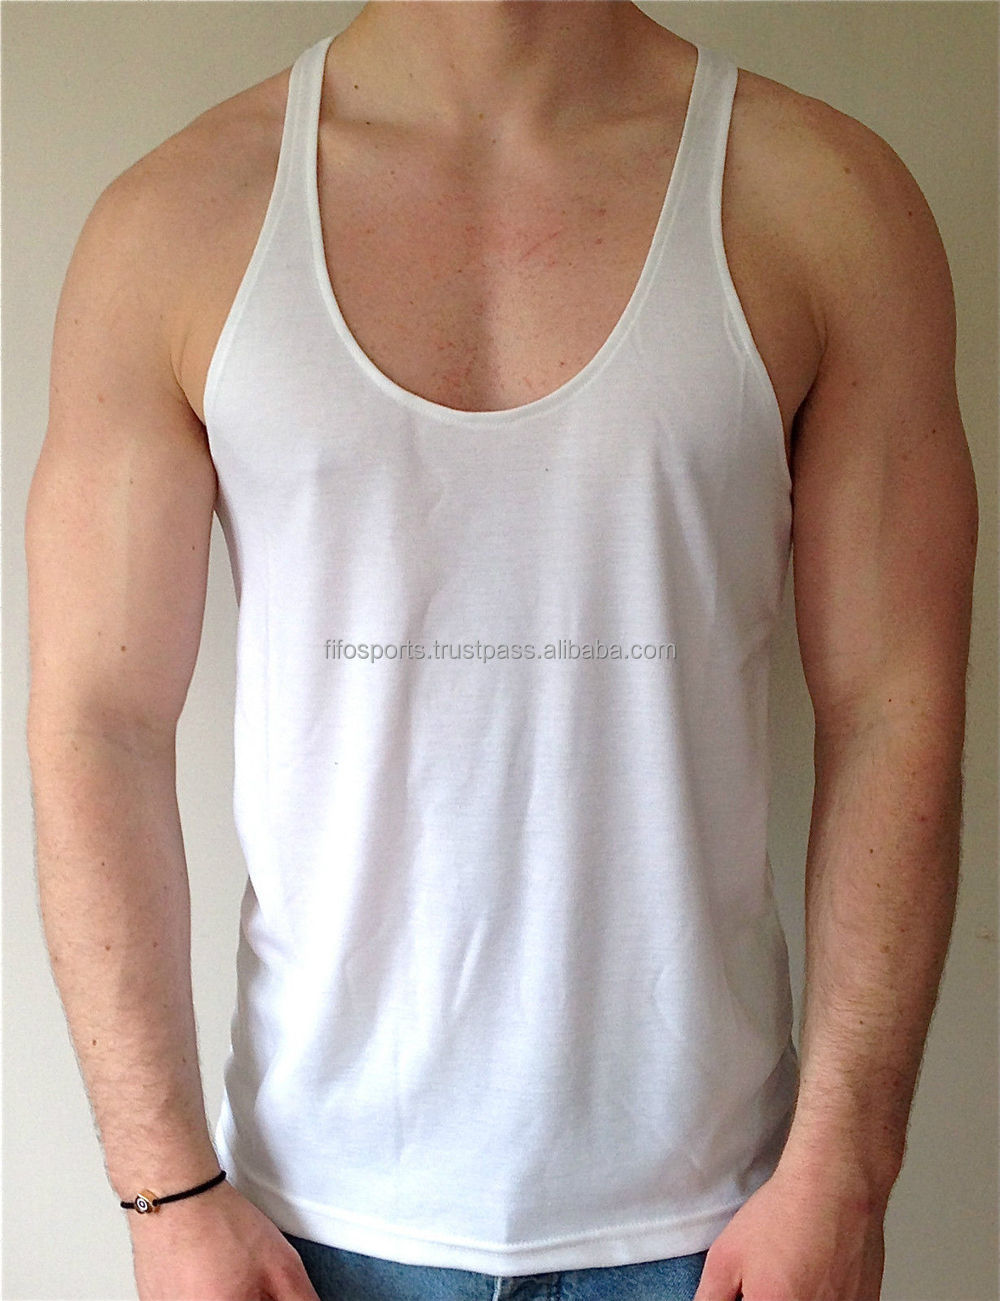 How to cut a men s workout shirt for Cut shirts for men